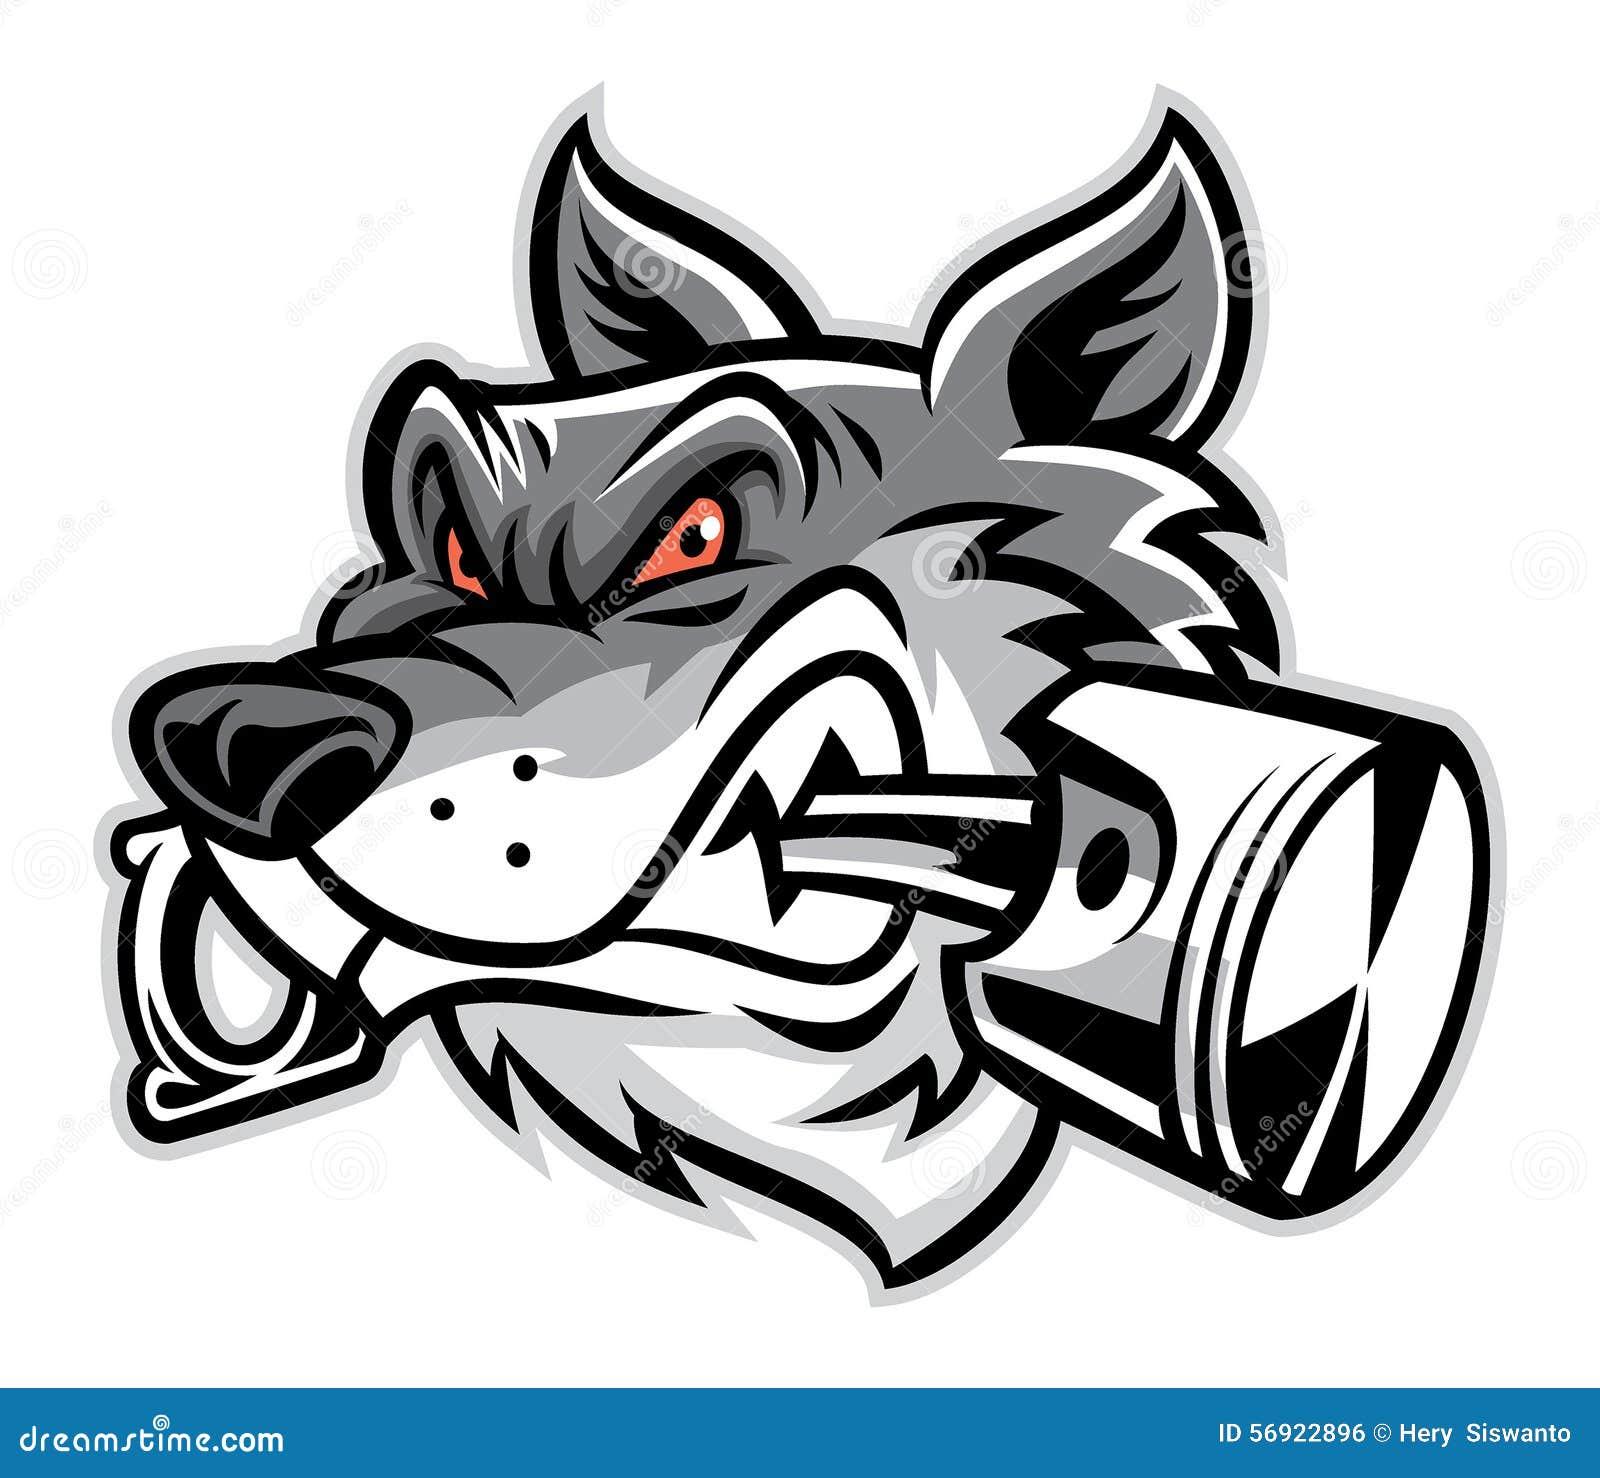 Wolf Bite The Piston Stock Vector Illustration Of Engine 56922896